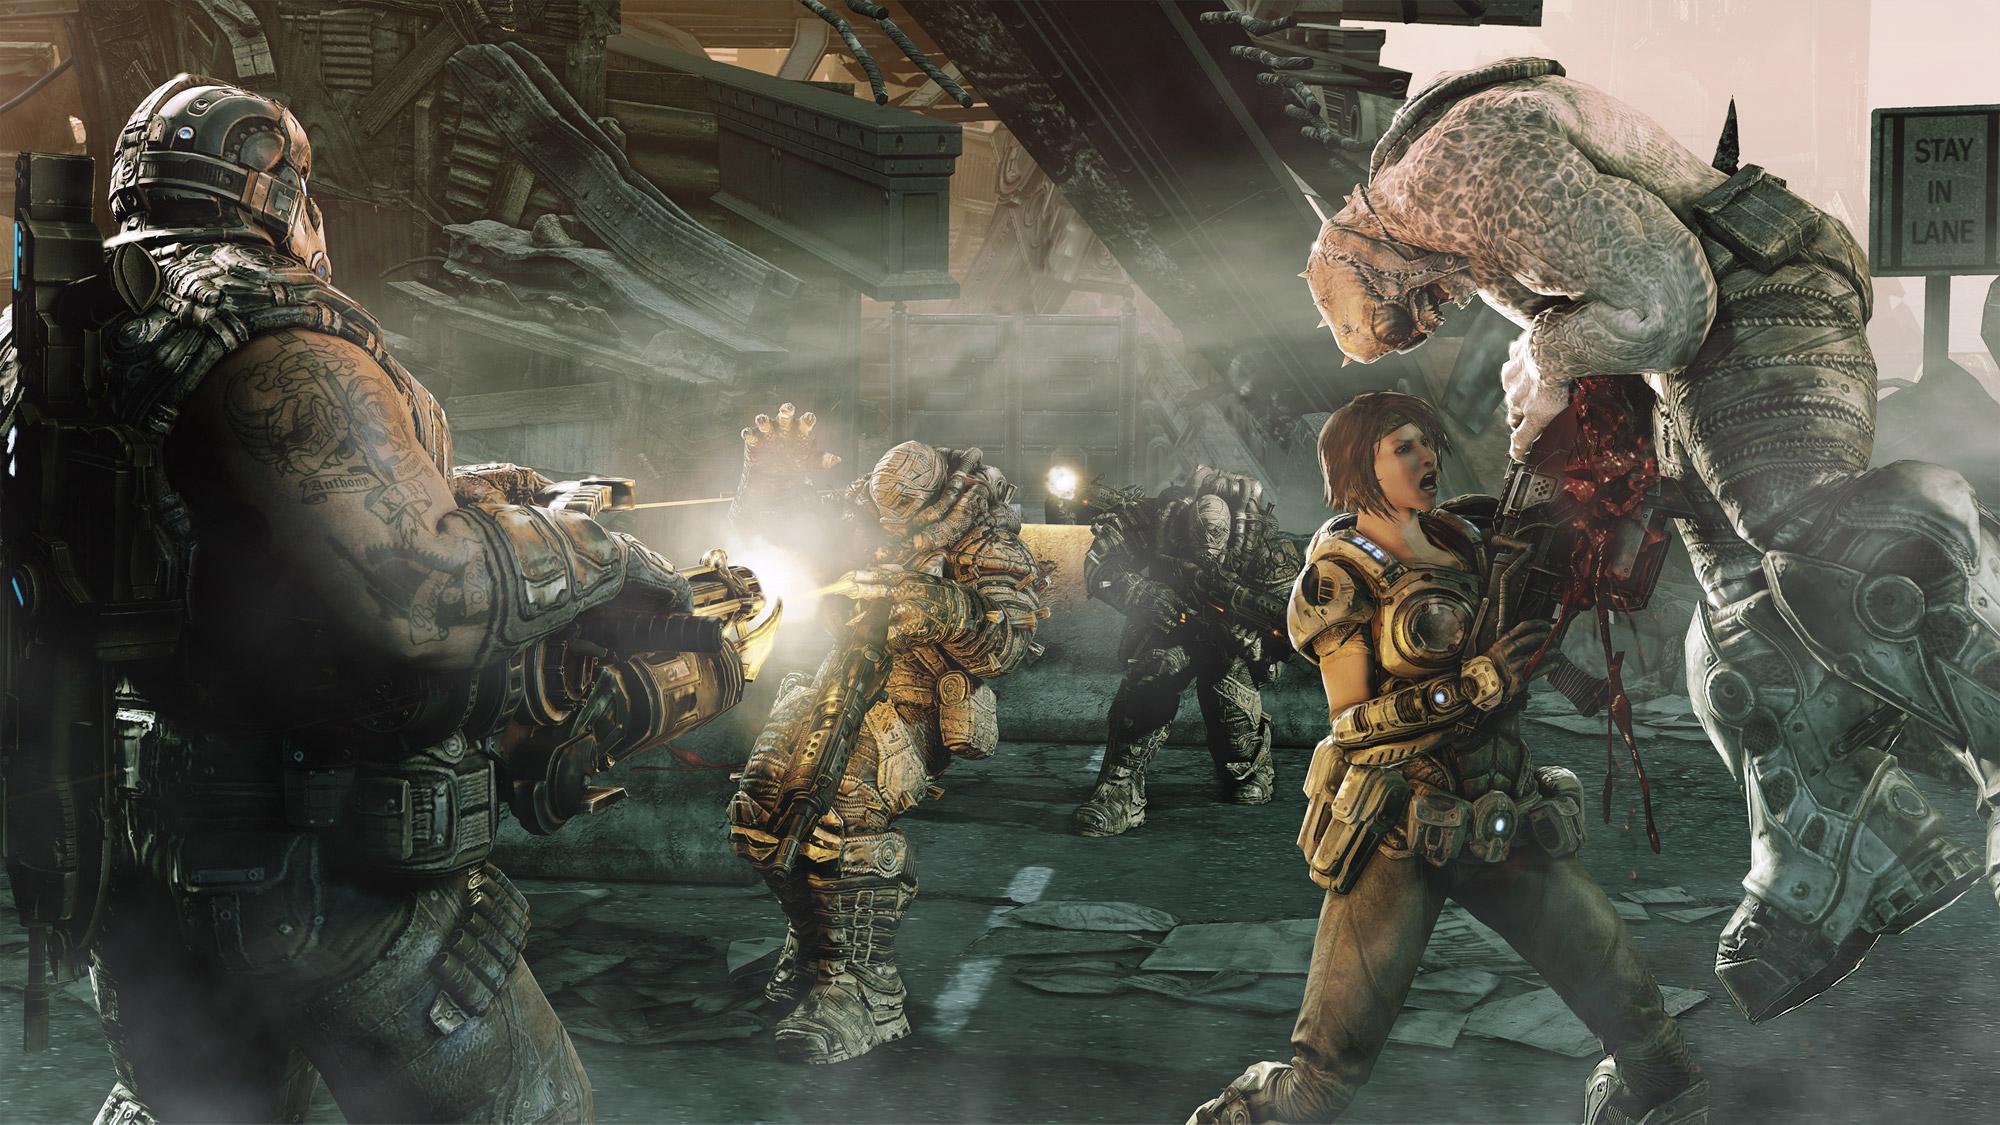 gears of war game A5